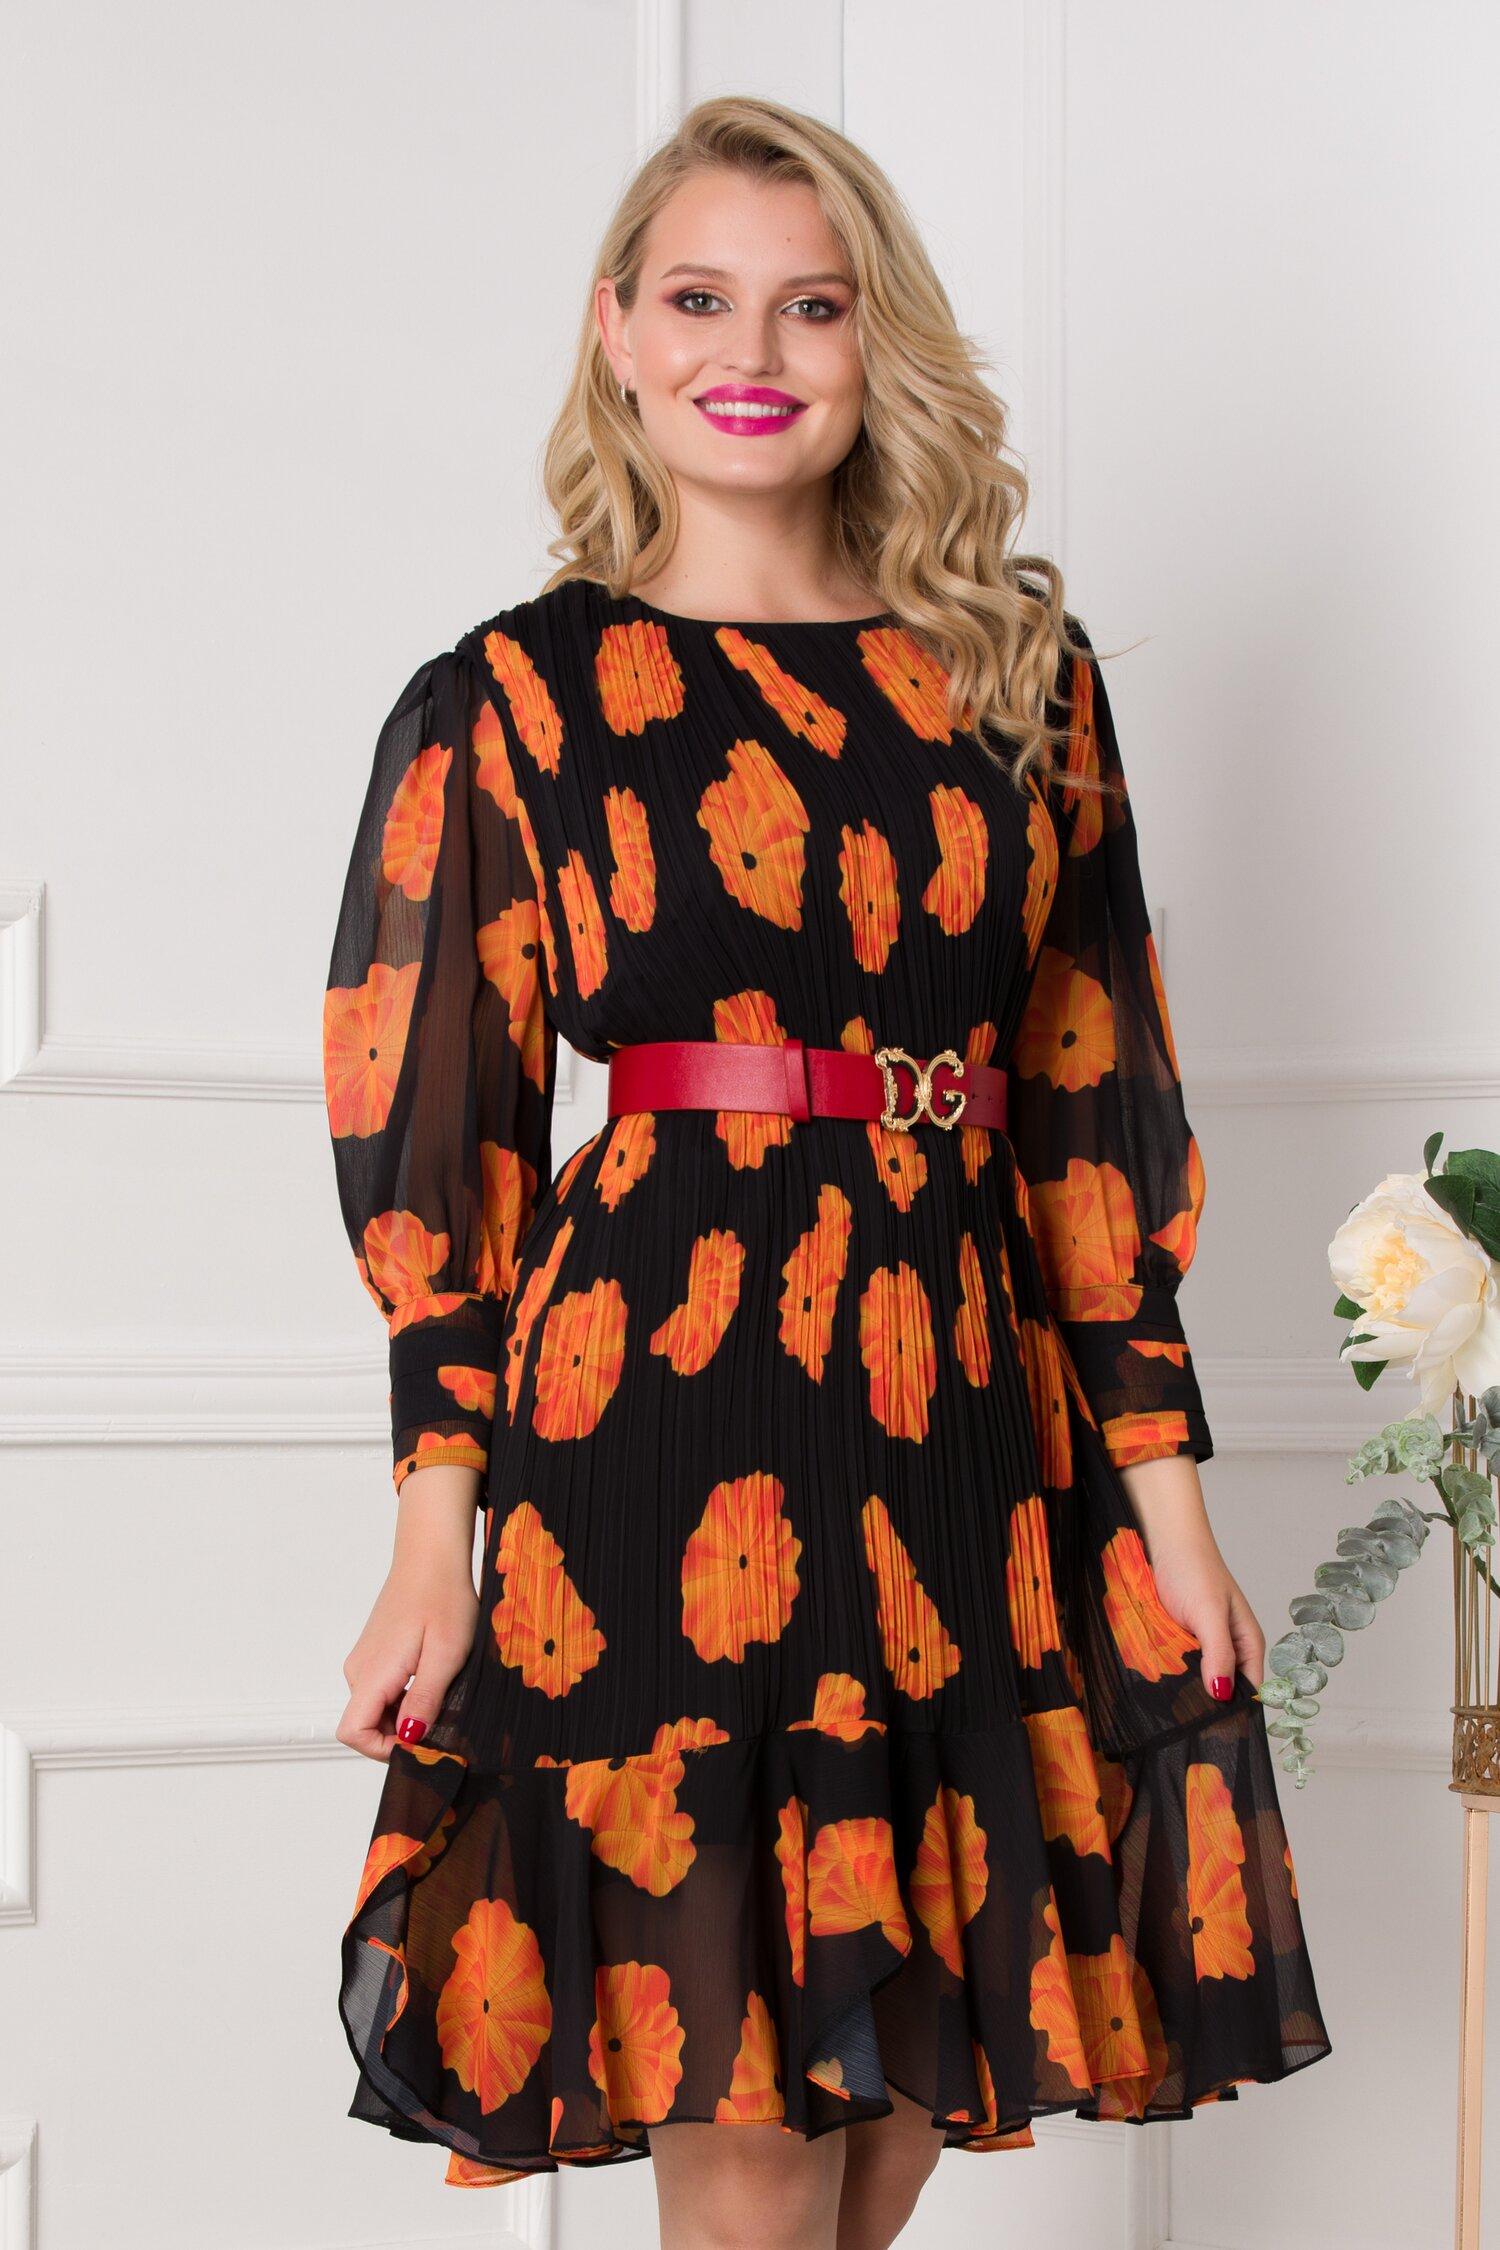 Rochie Maria plisata neagra cu imprimeu floral orange